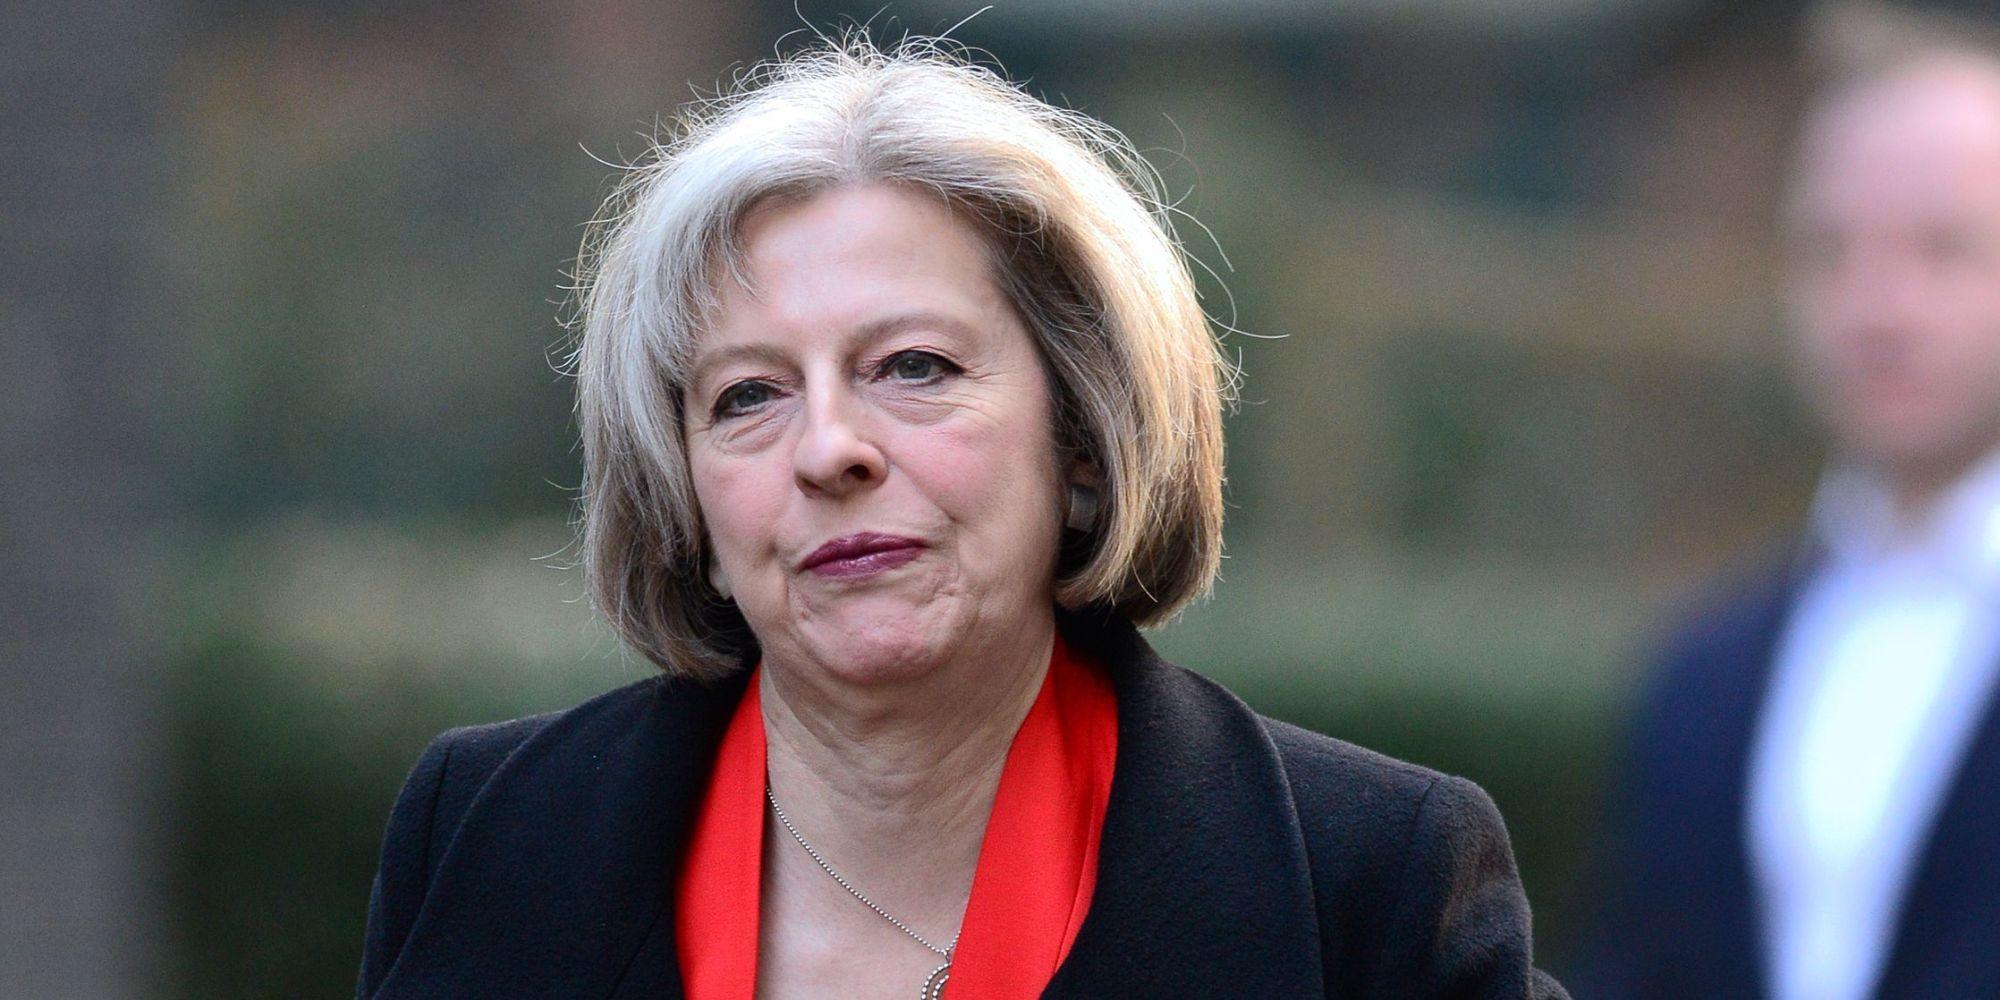 Photo of Theresa May: Savior or slaughterer of black people?